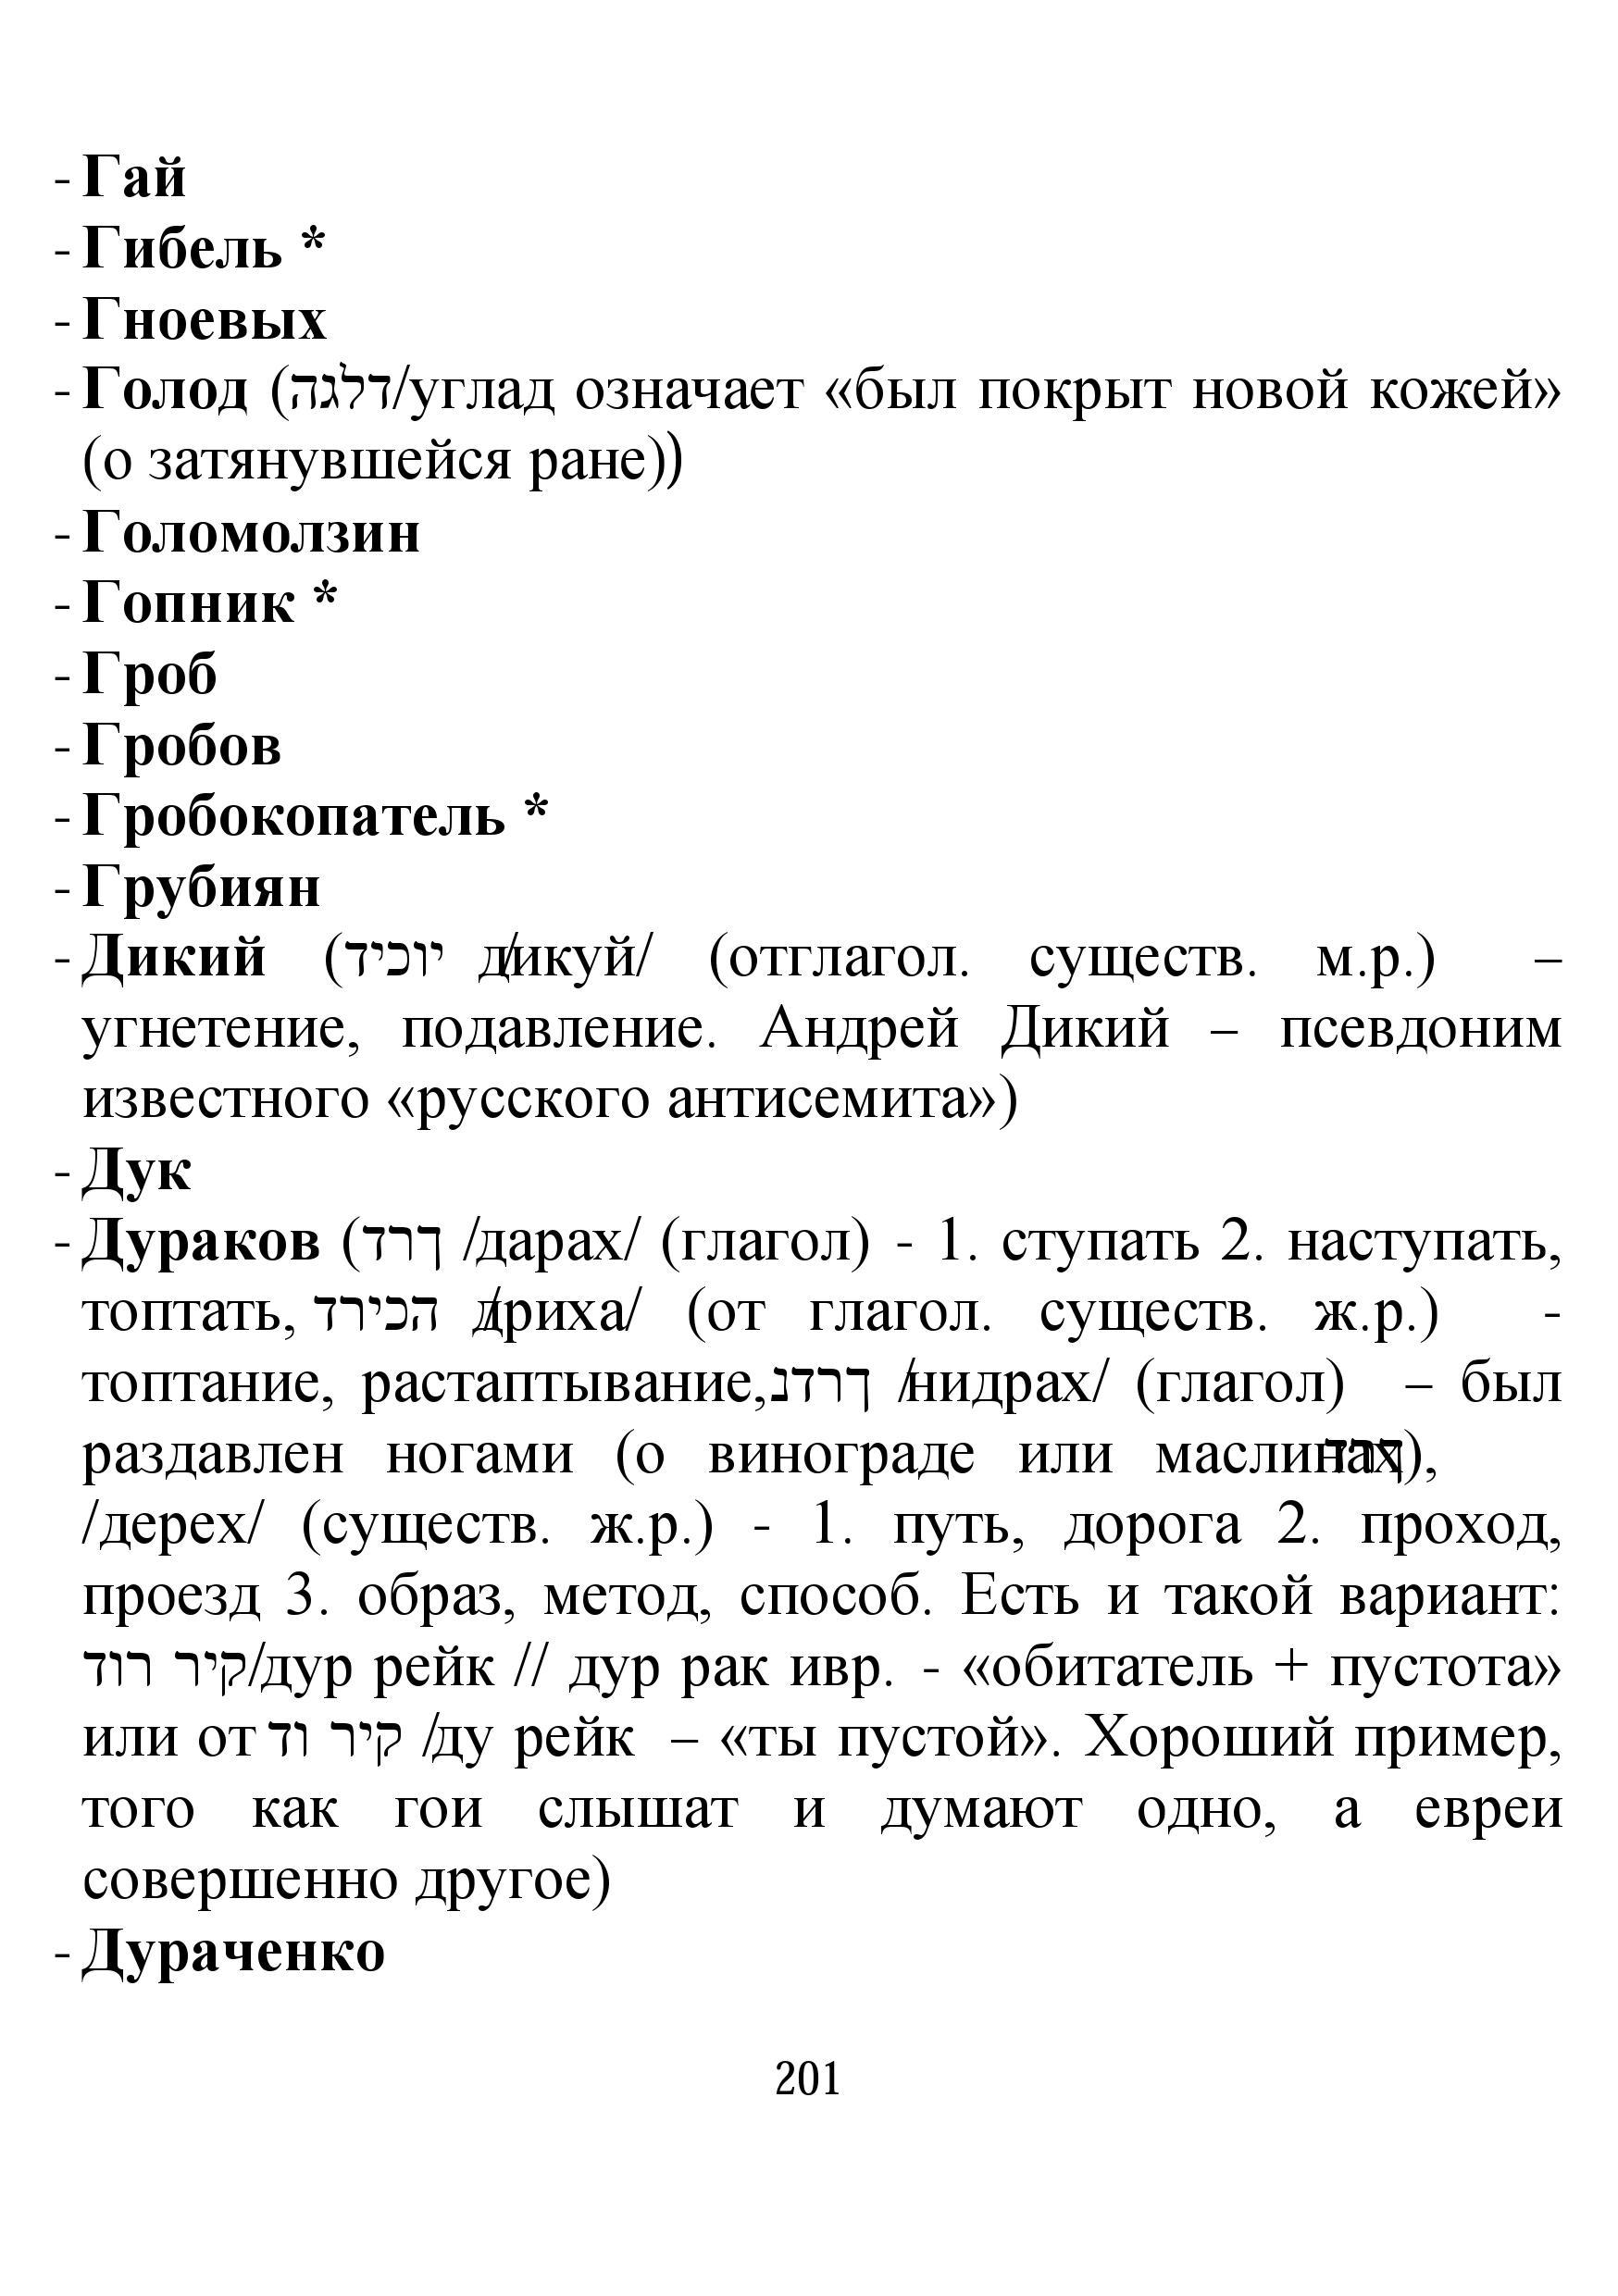 http://s6.uploads.ru/Q8ojM.jpg